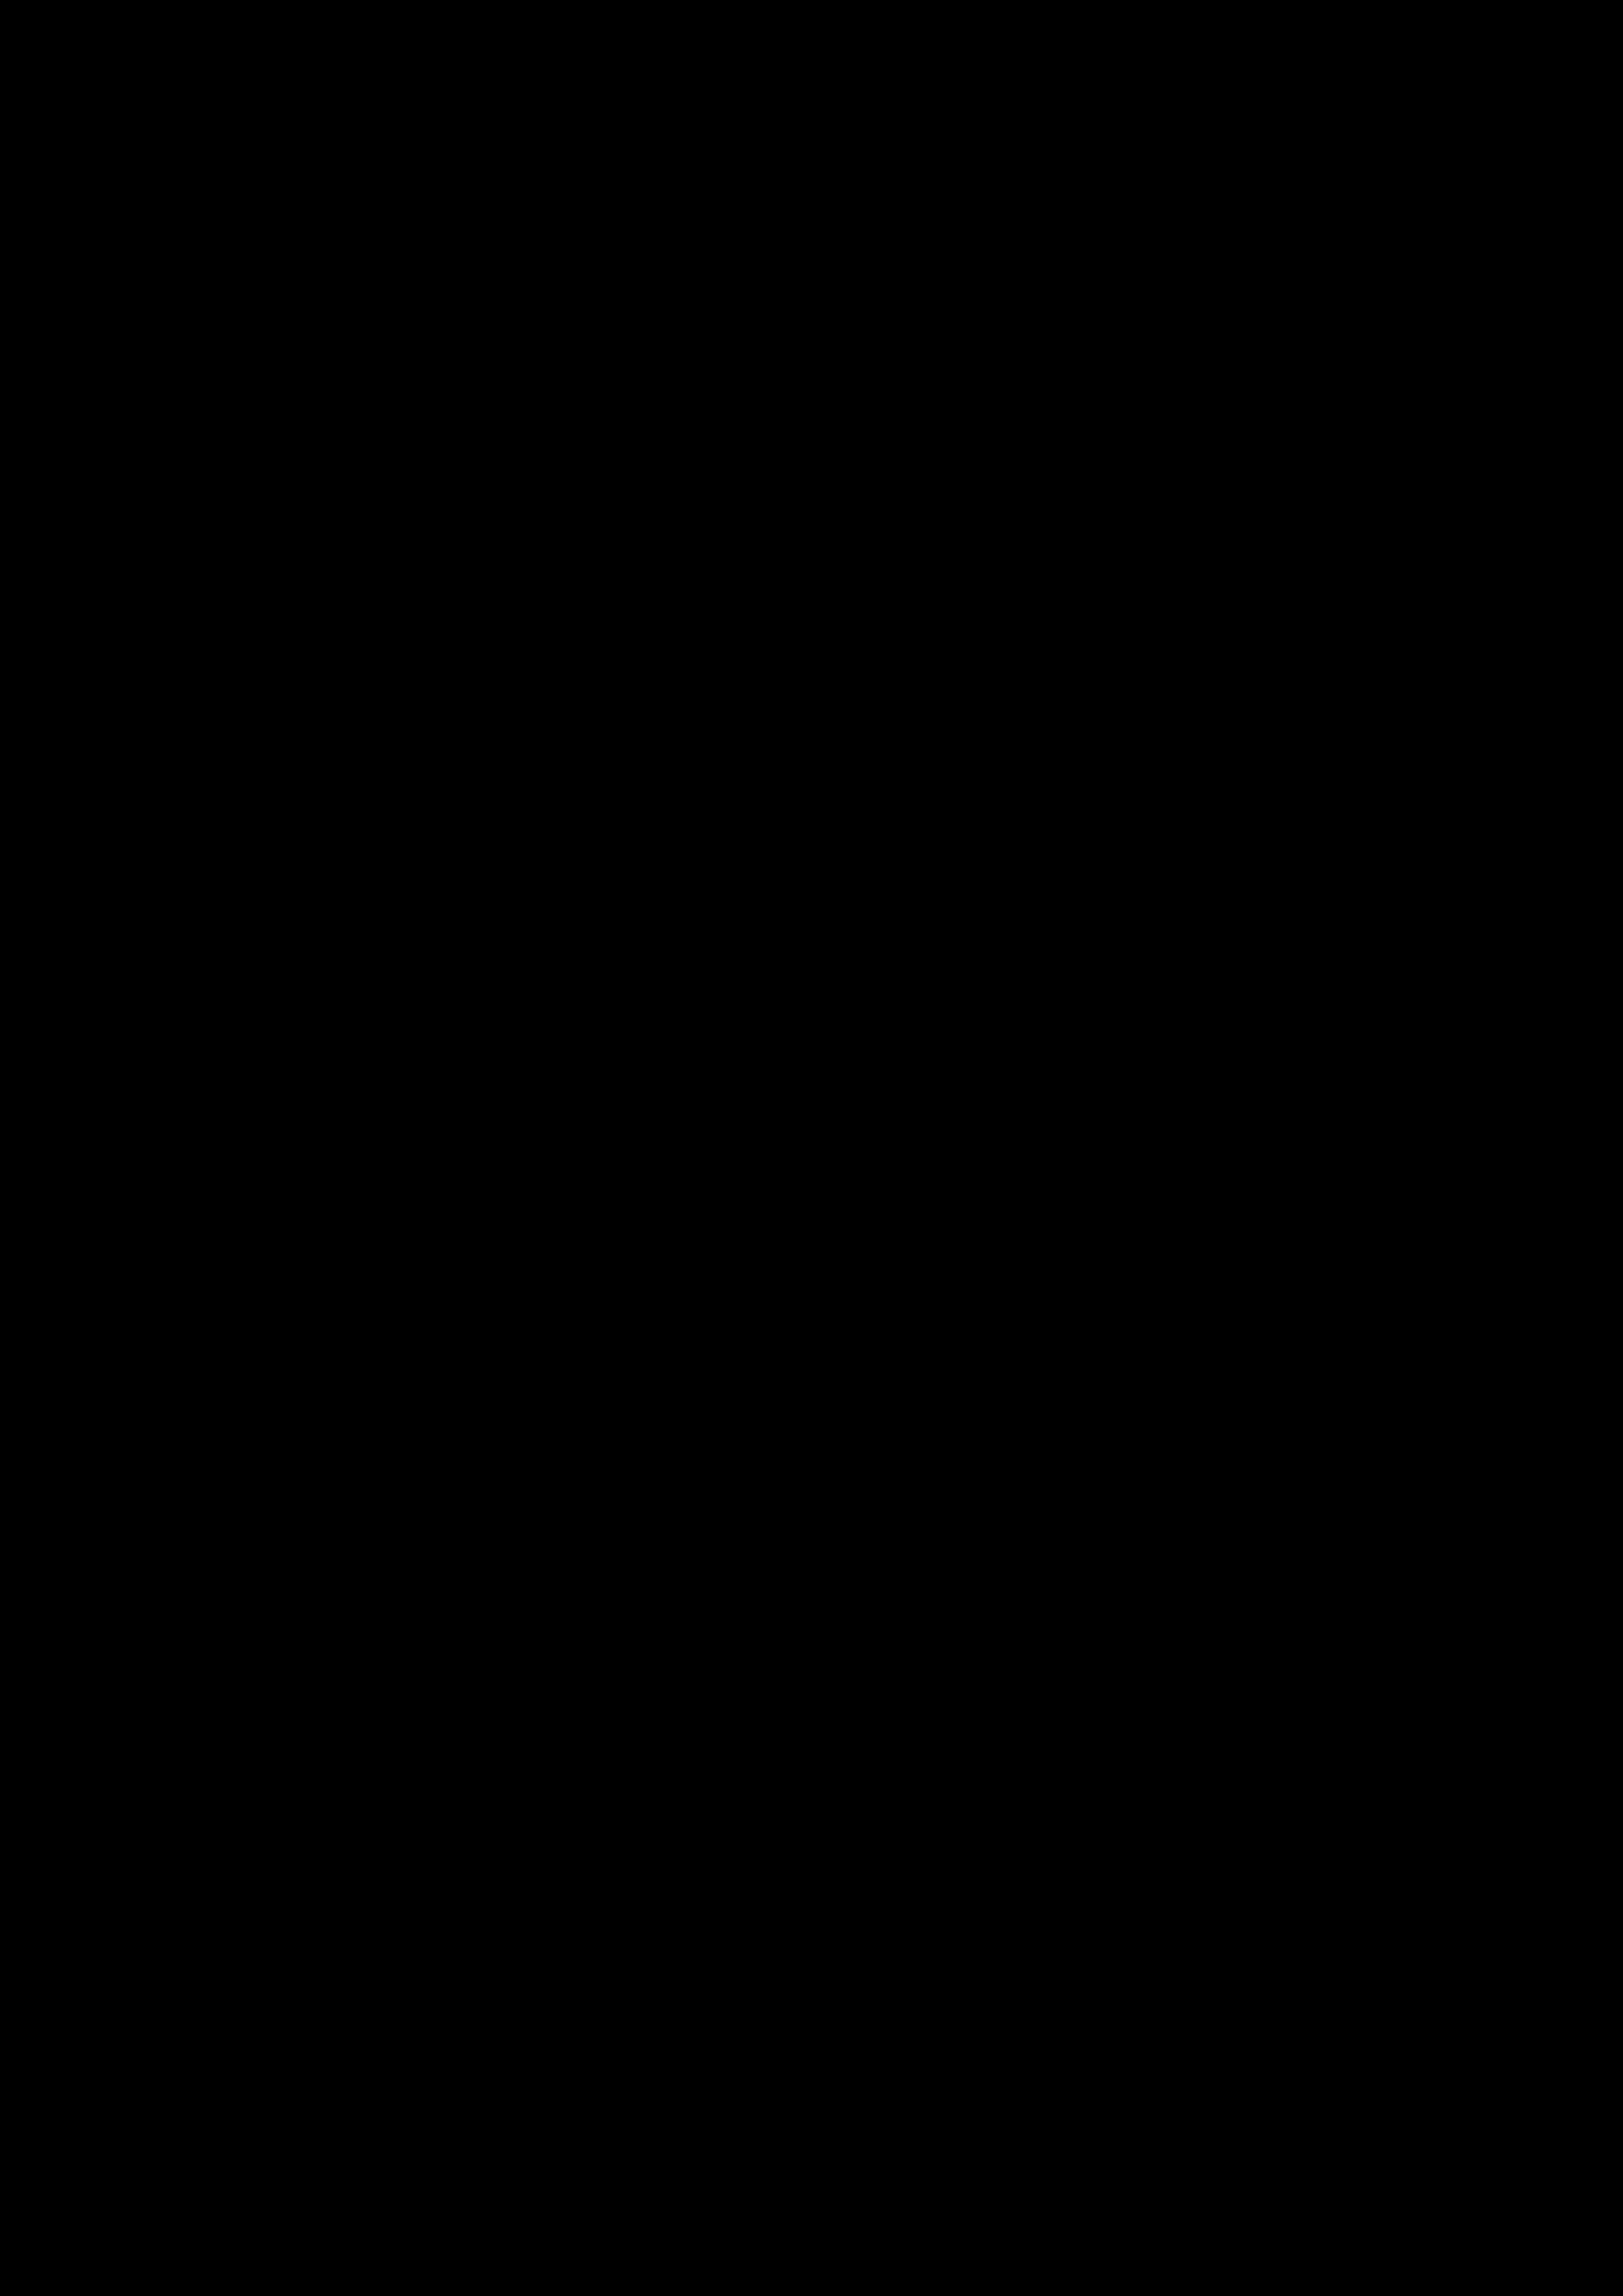 GitHub - lemduc/CSCI599-TransformMusicProject: CSCI599